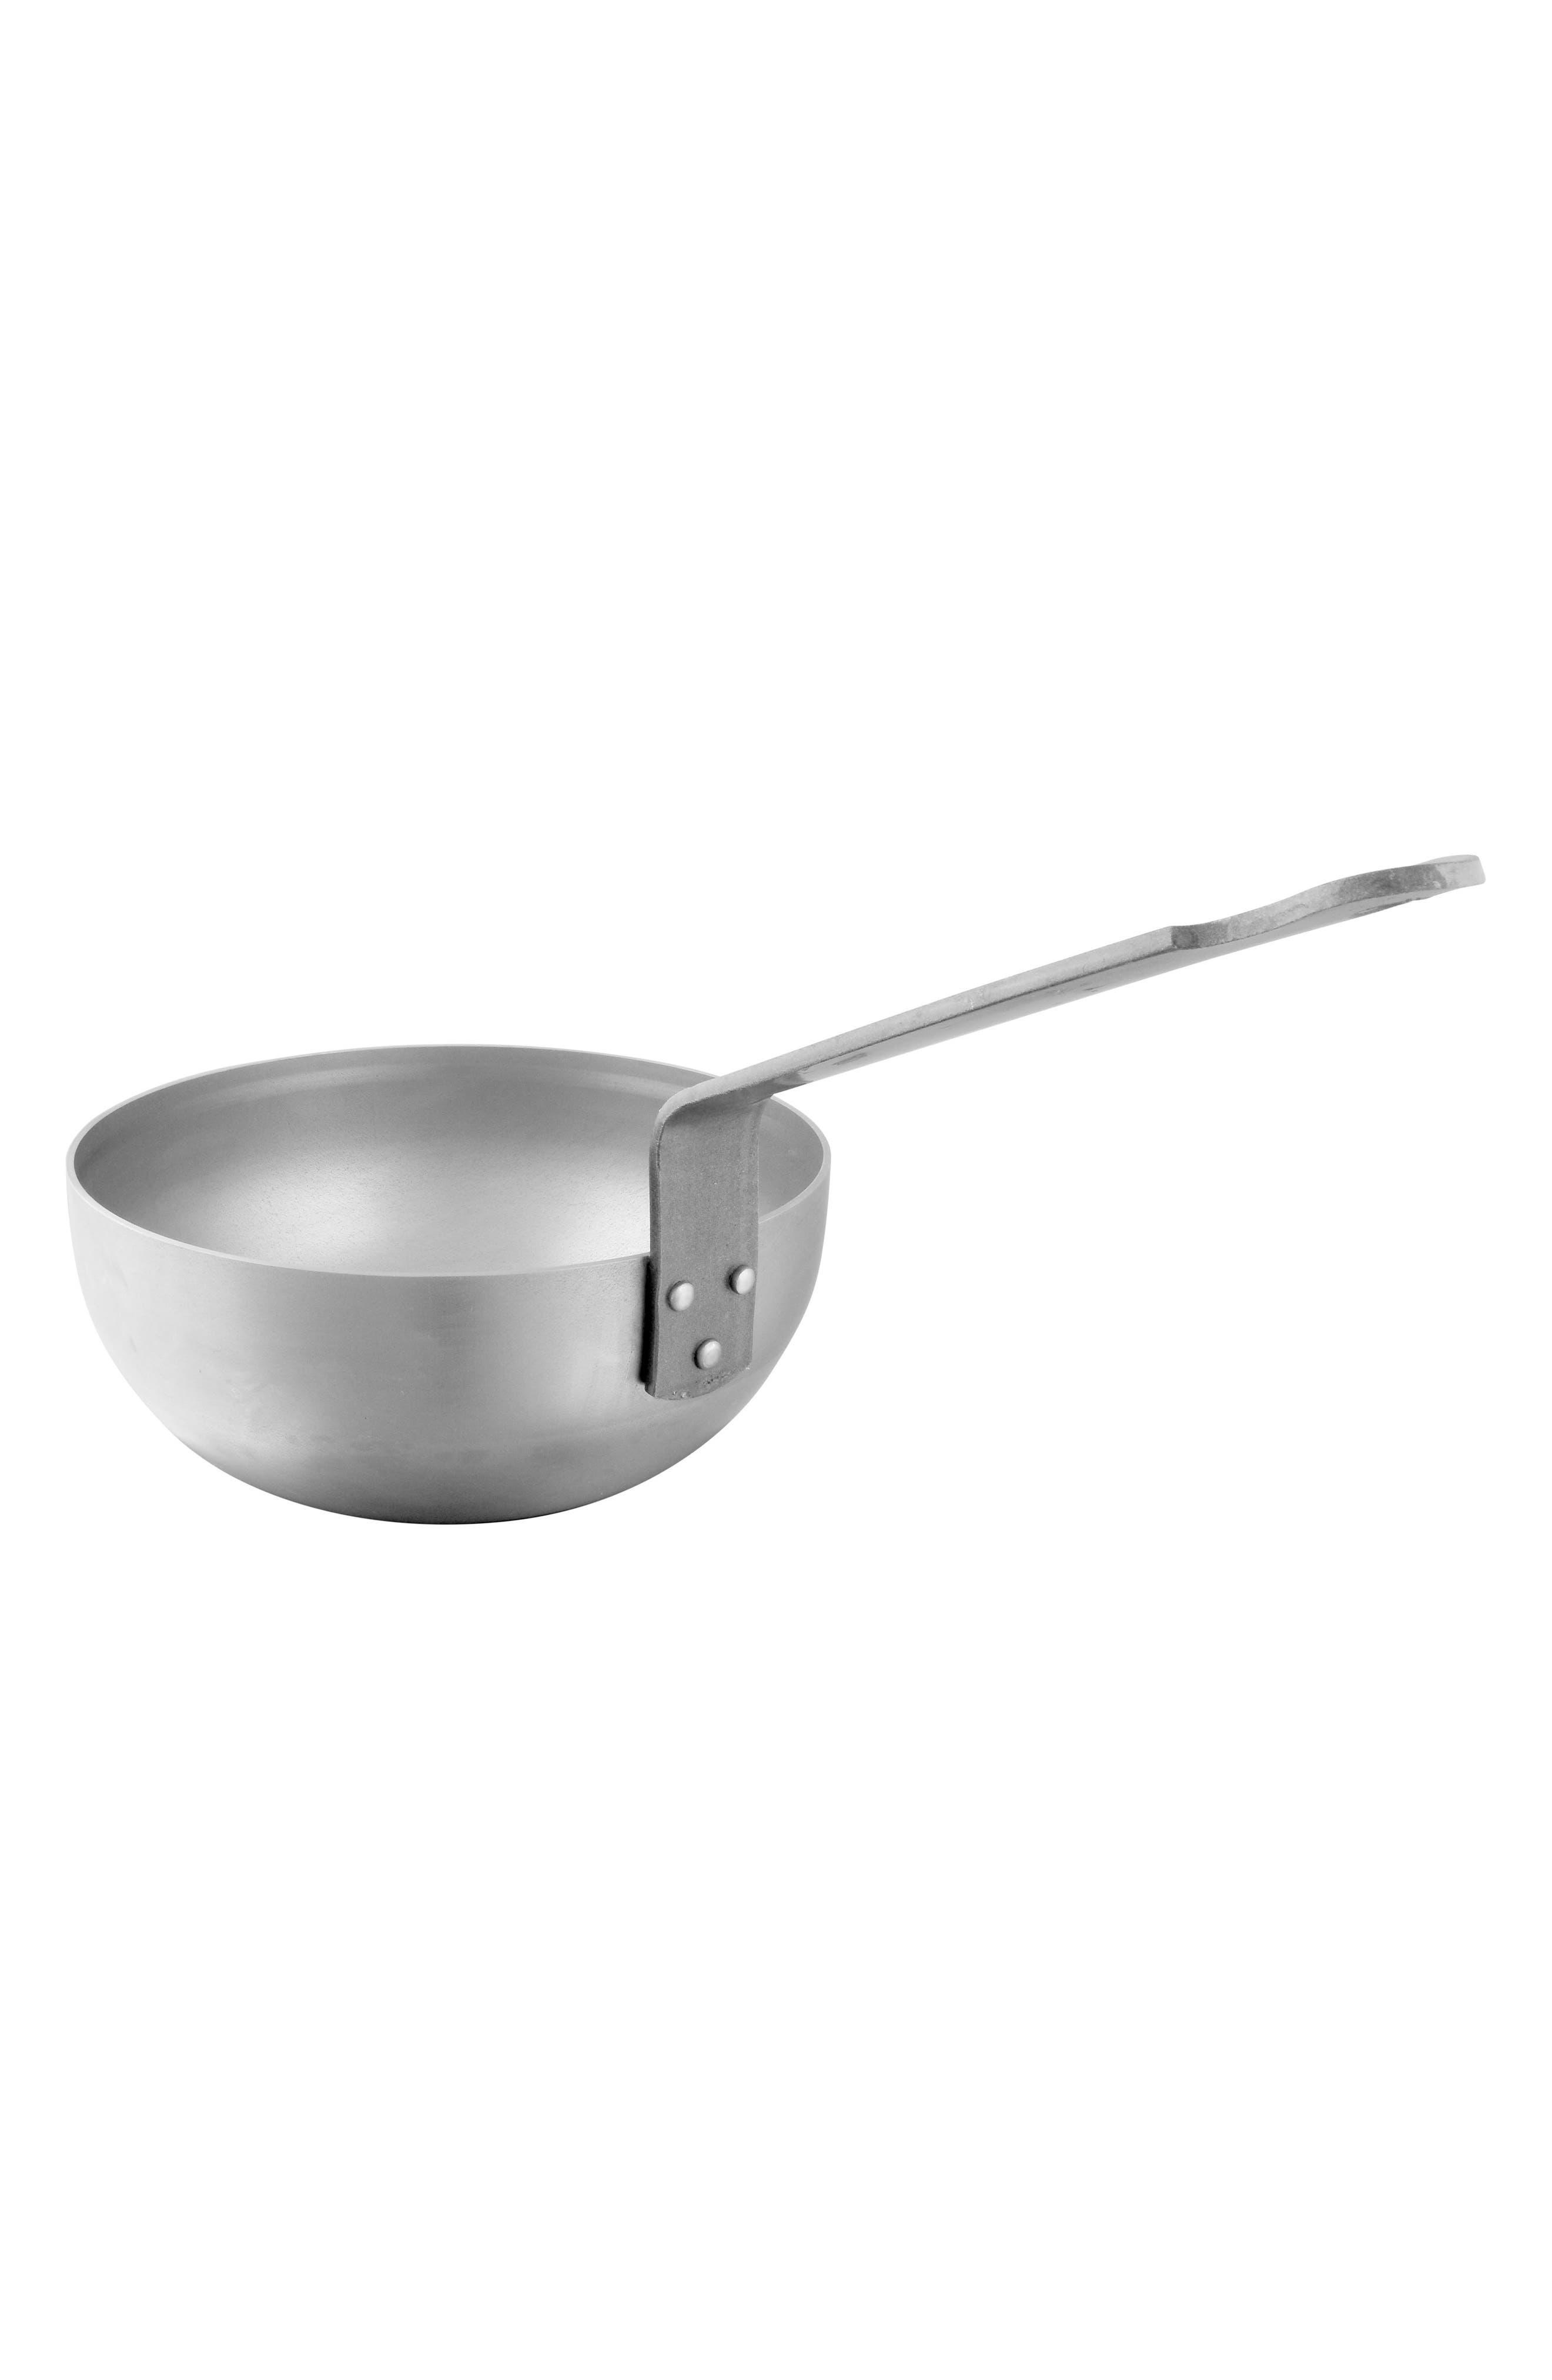 Mauviel M'steel Carbon Steel Splayed Curved Sauté Pan